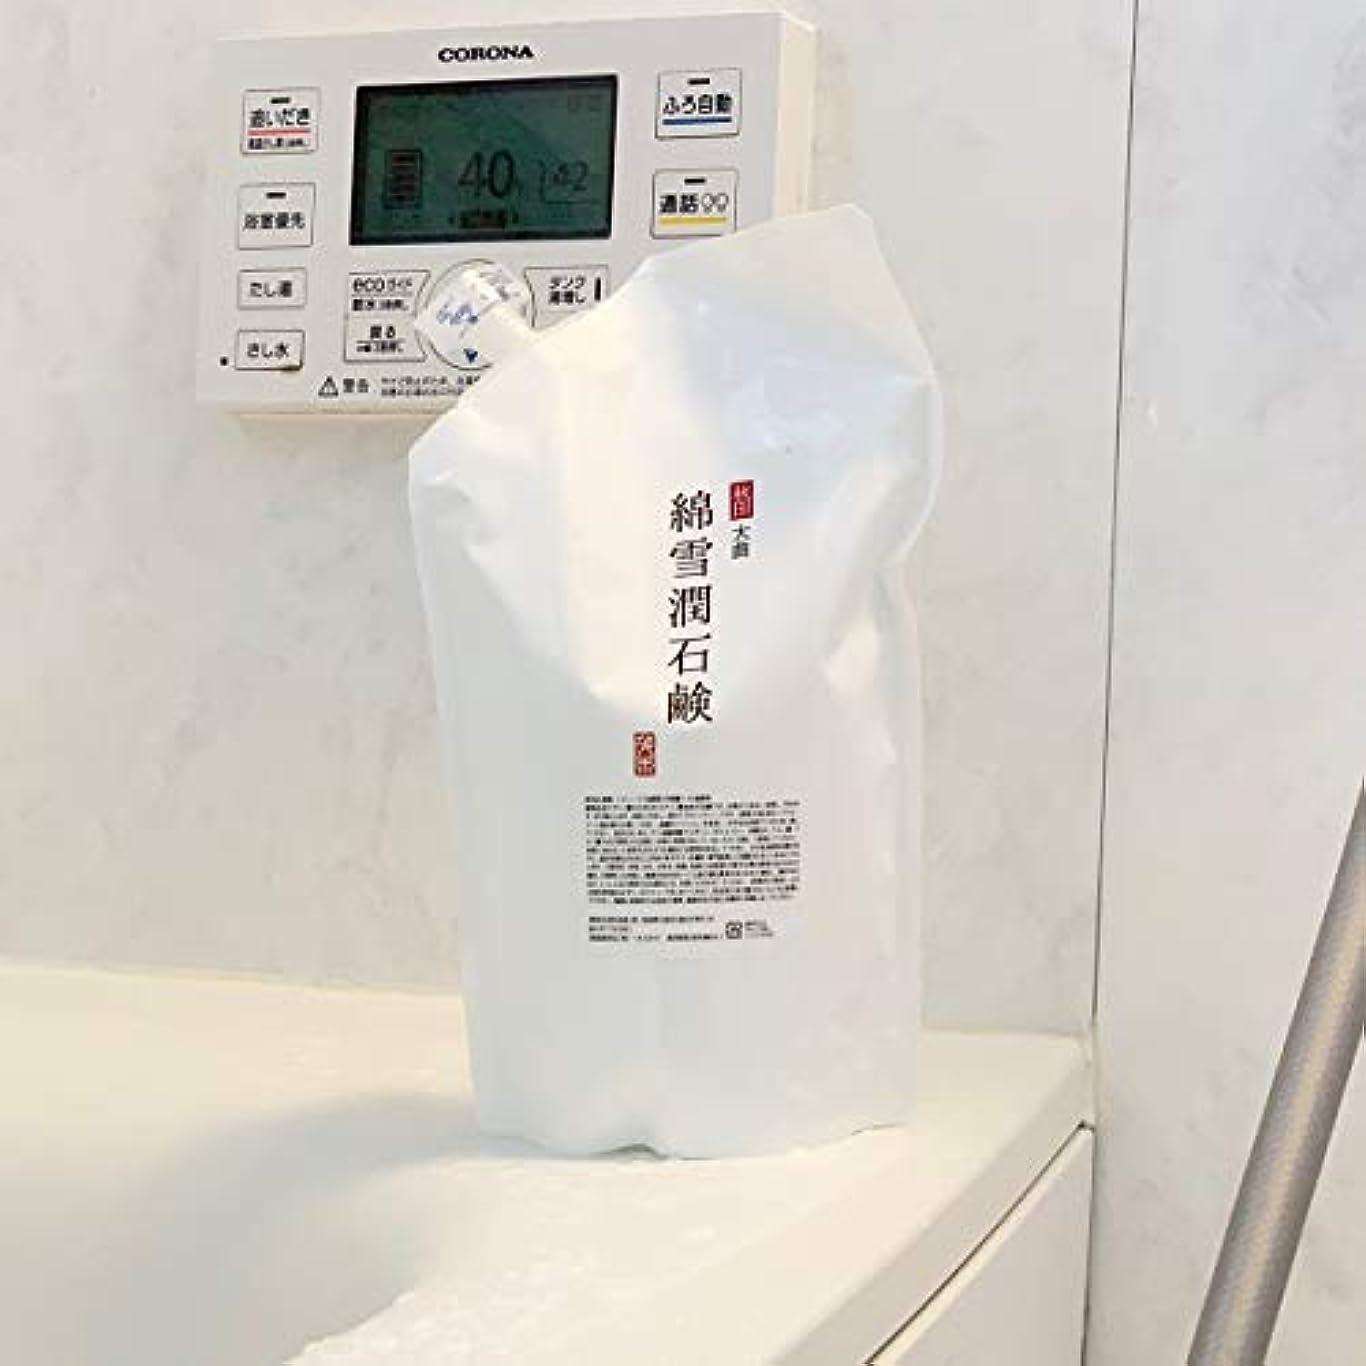 反発病弱衝動綿雪潤石鹸700mL(液状タイプ)